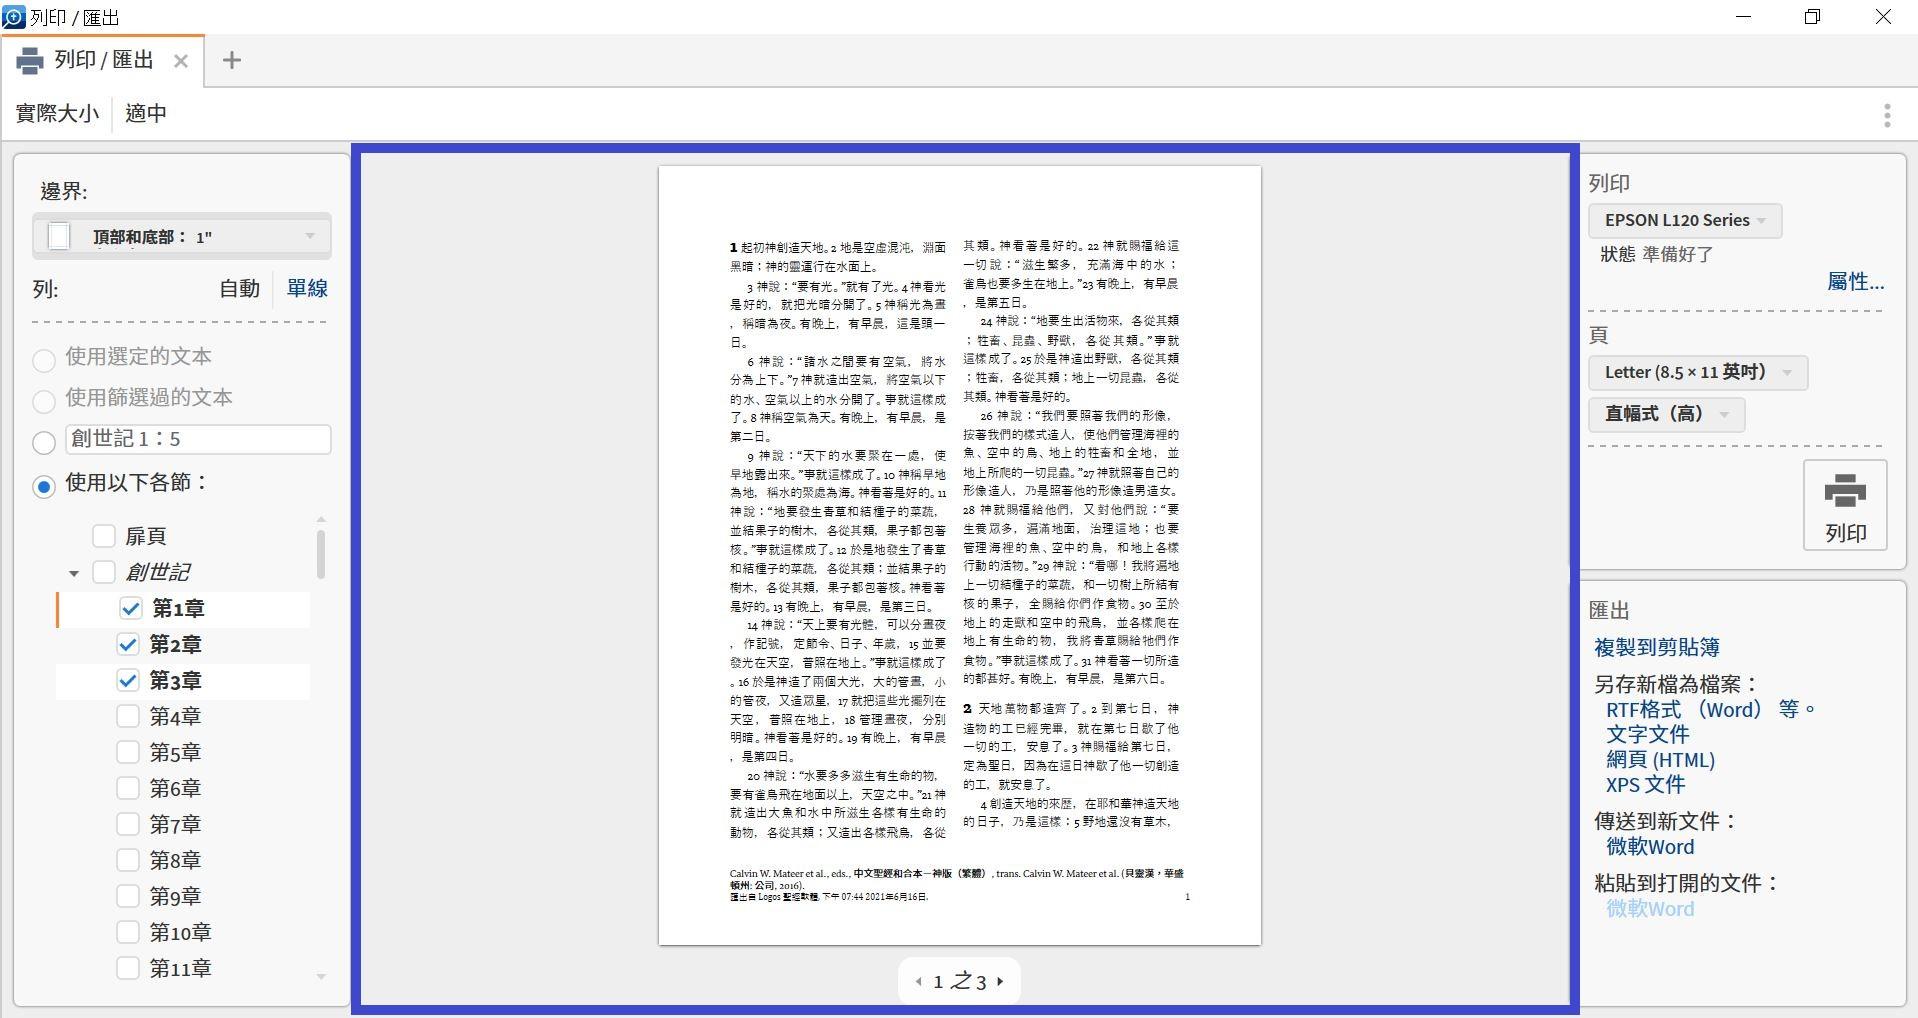 Screen_Shot_2019-09-17_at_1.11.55_PM_copy_2.png